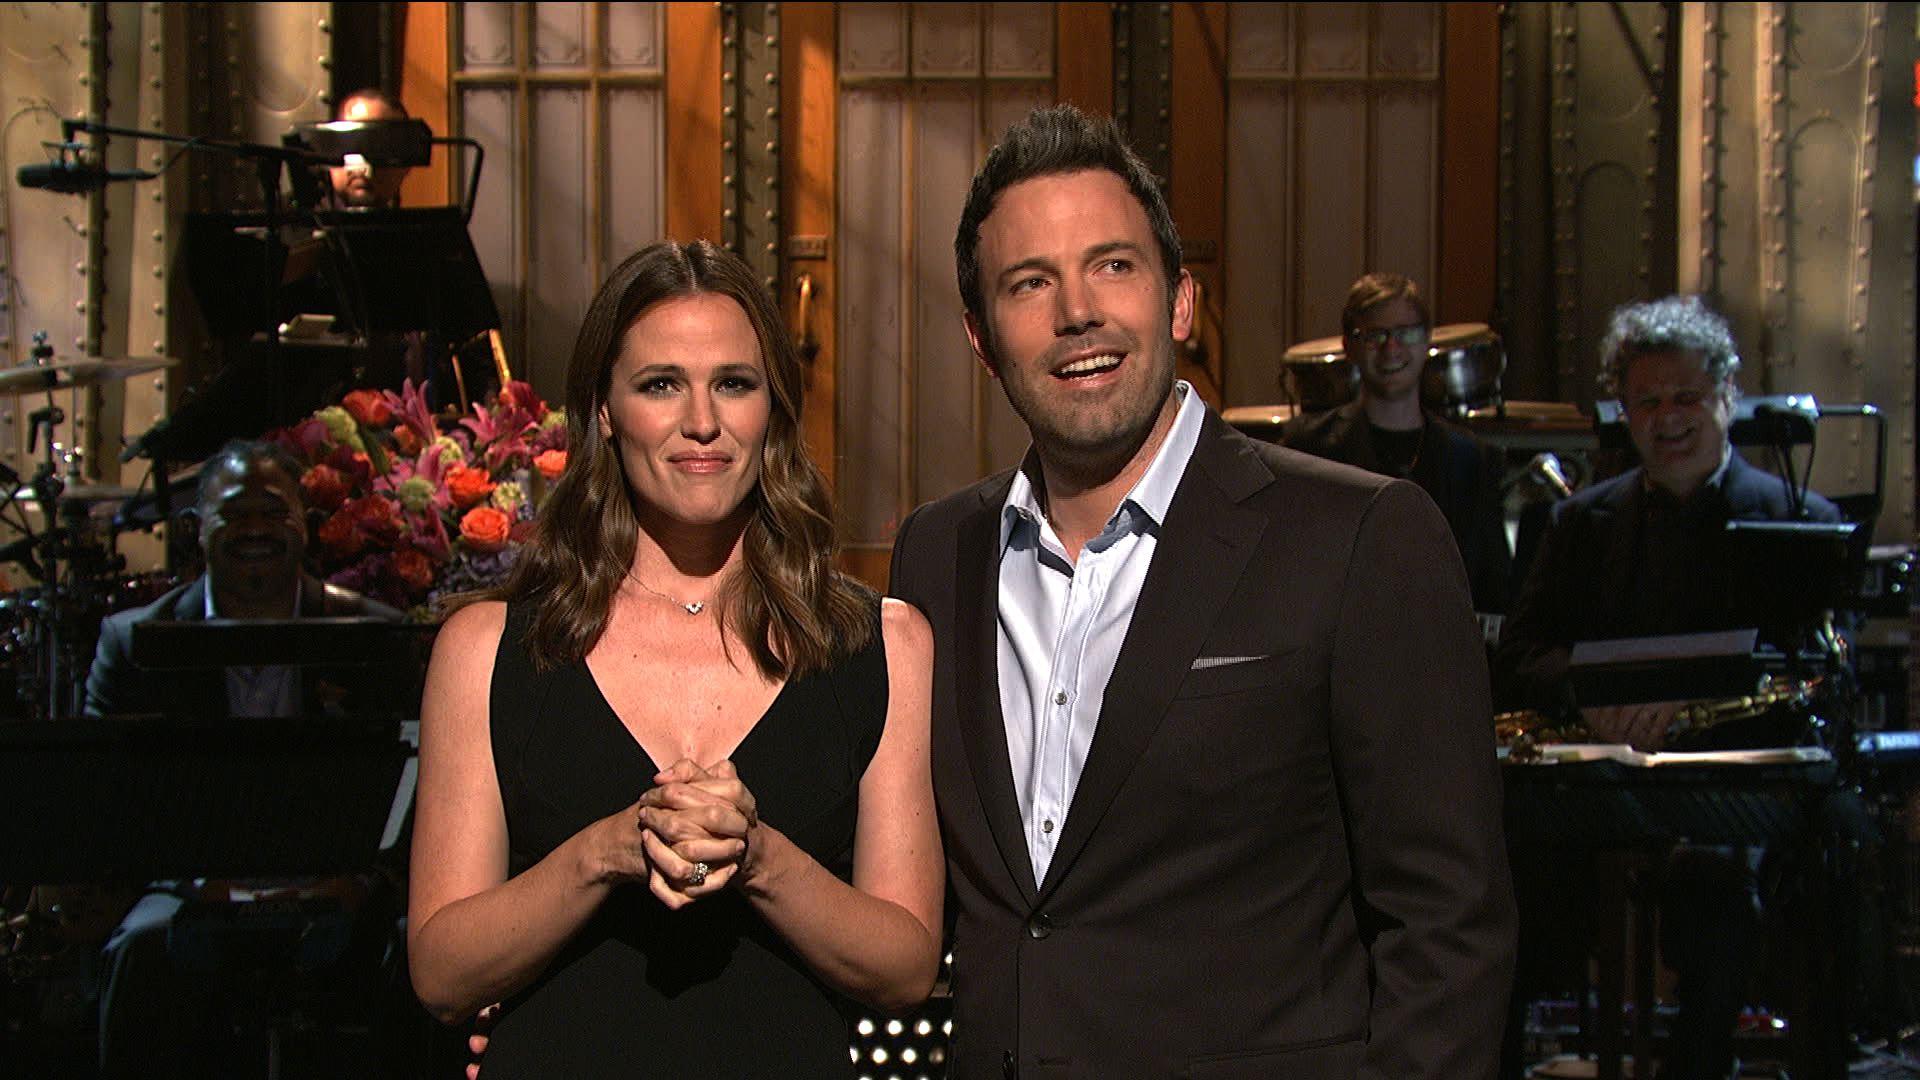 Saturday Night Live Season 44 Episode 21 - YouTube